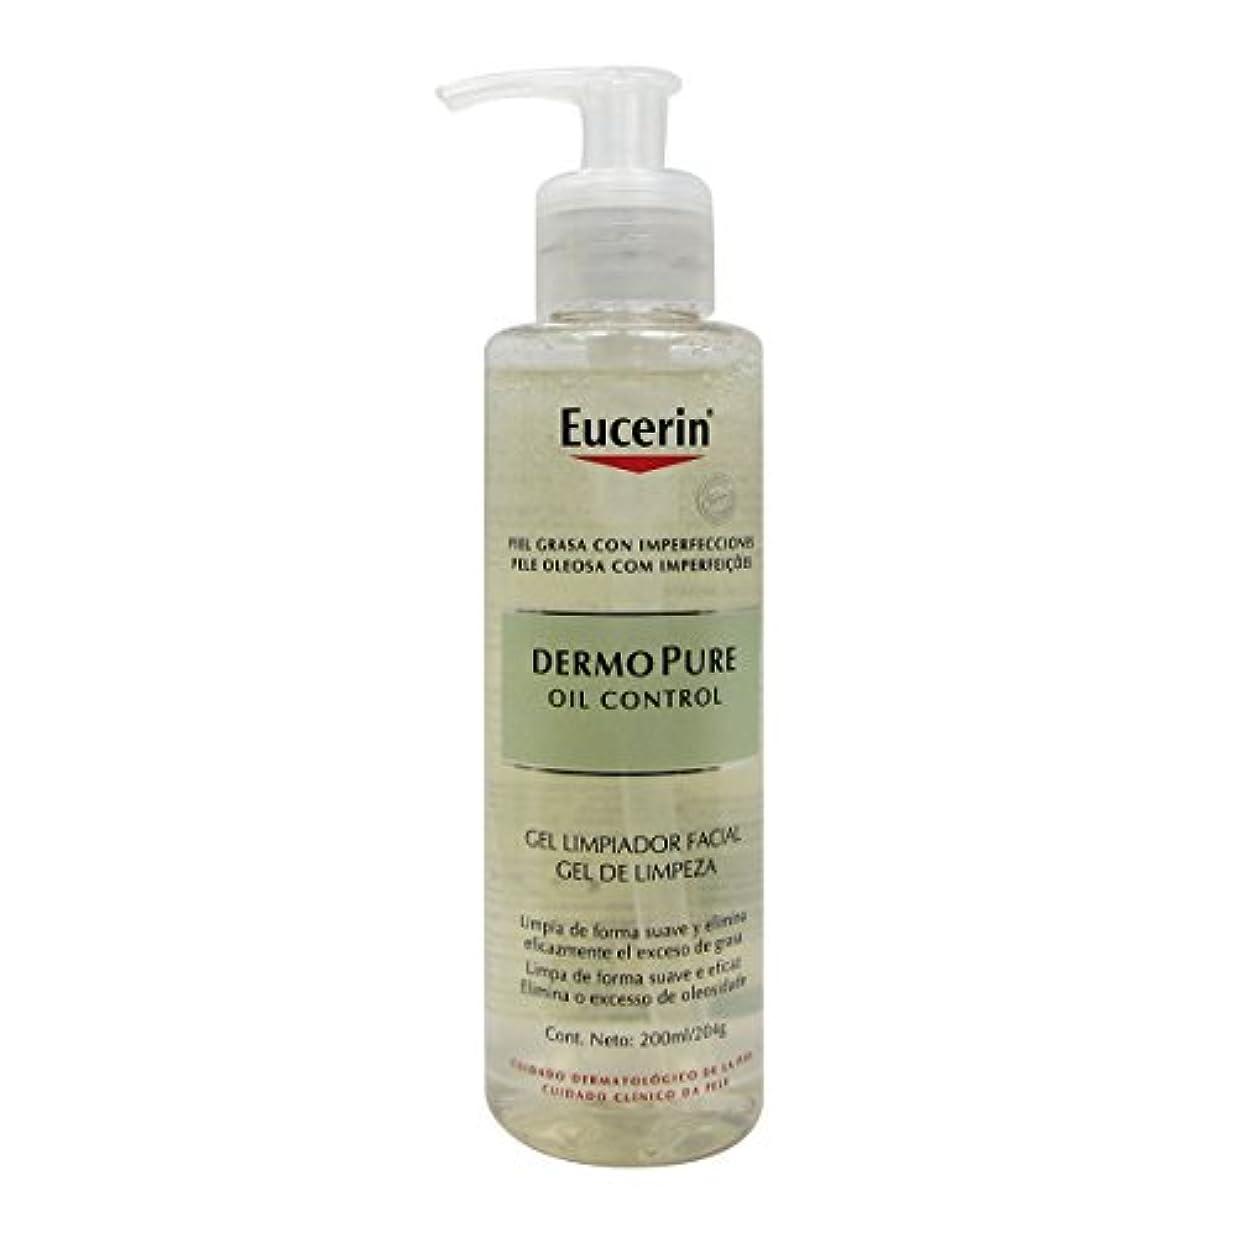 Eucerin Dermopure Cleansing Gel 200ml [並行輸入品]